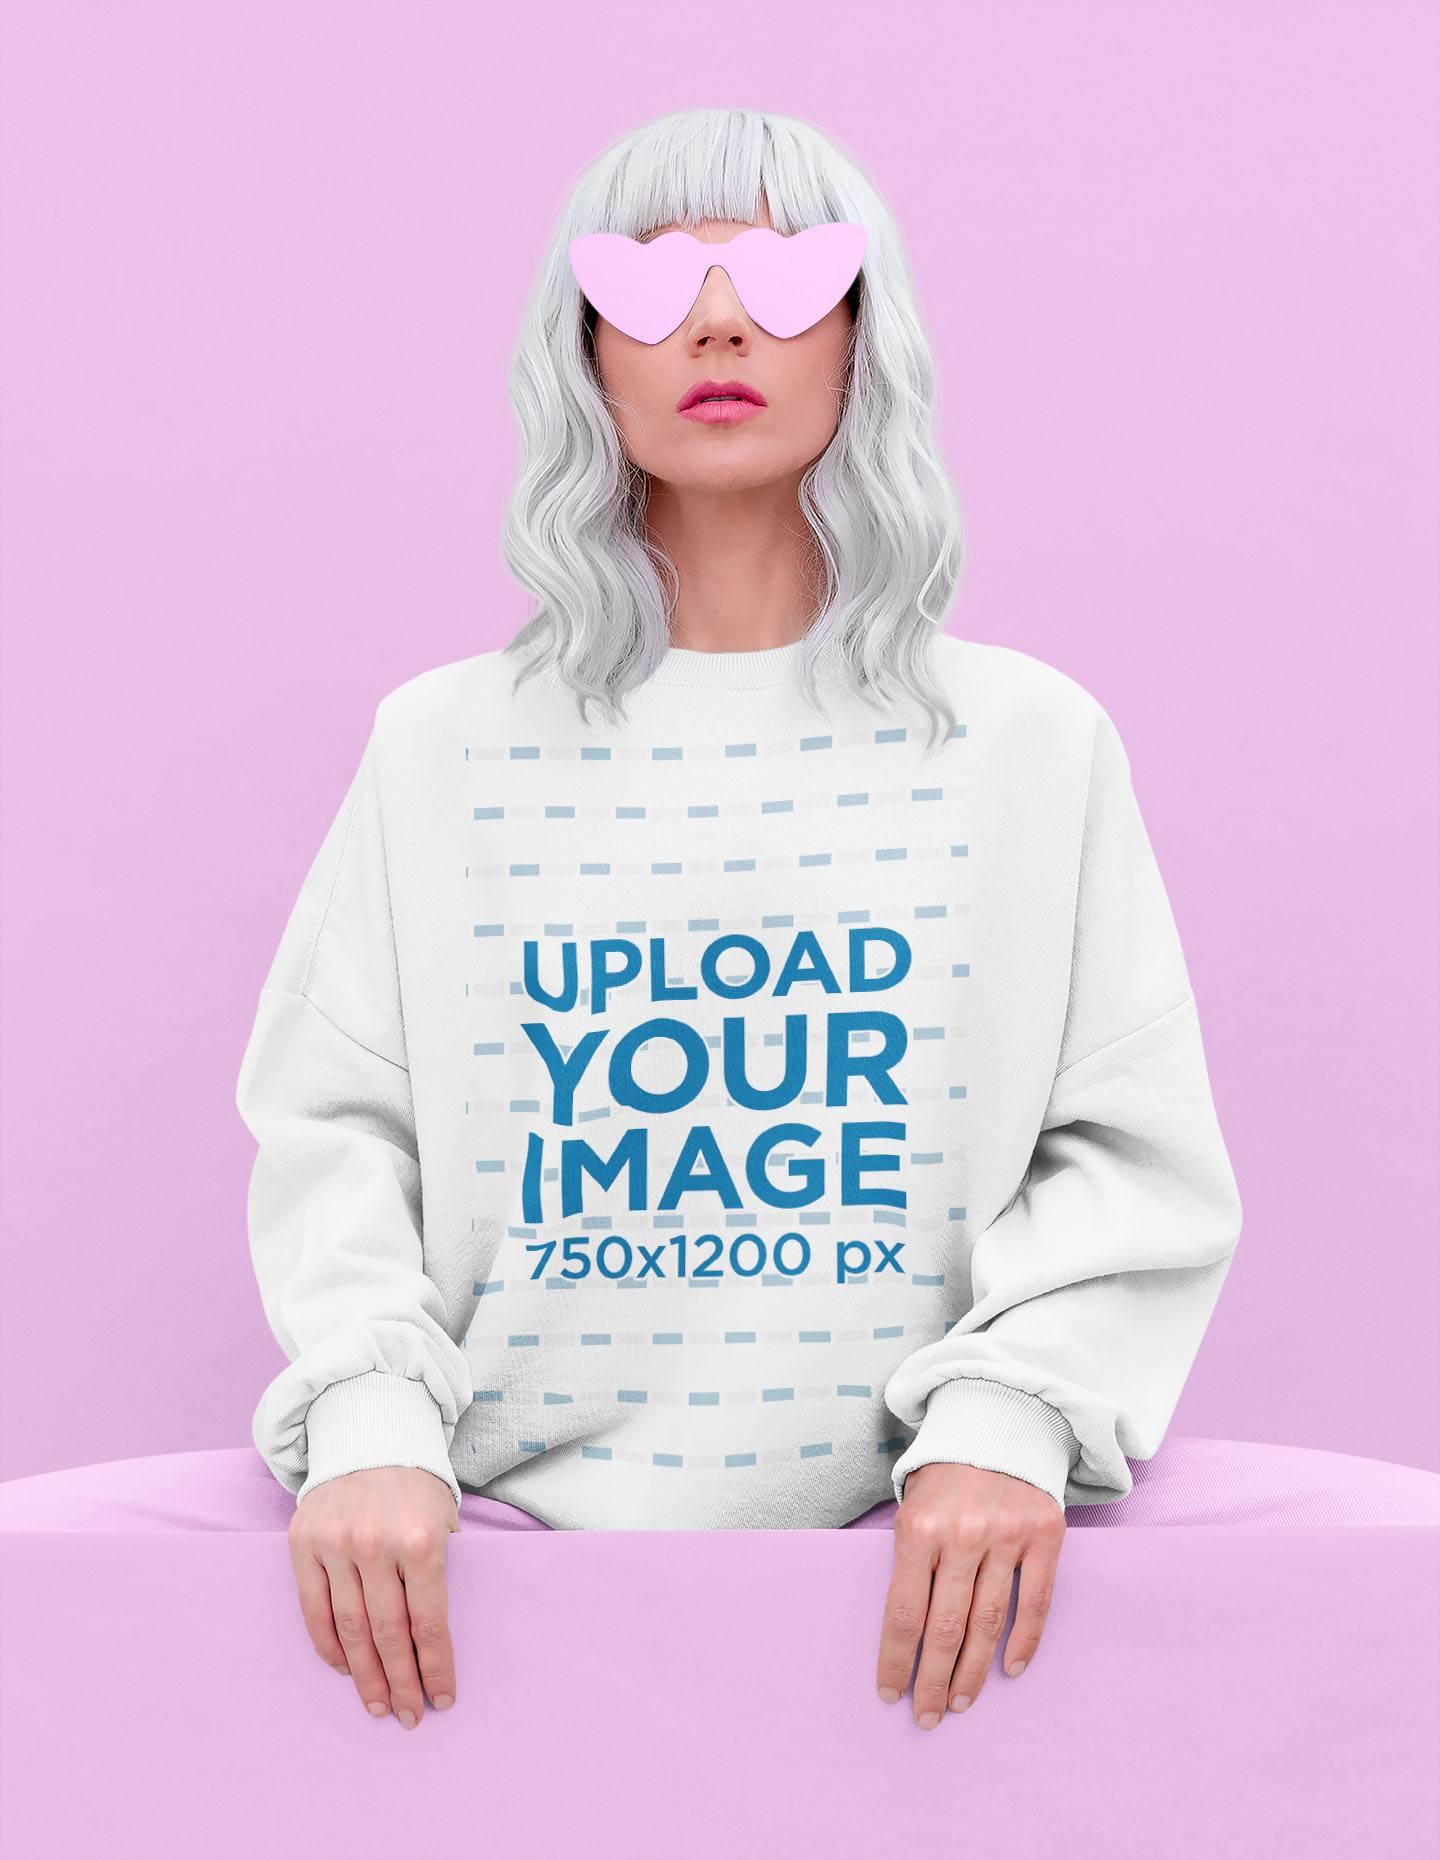 Sweatshirt Mockup of a Woman with an Edgy Look Posing at a Studio 43673-r-el2